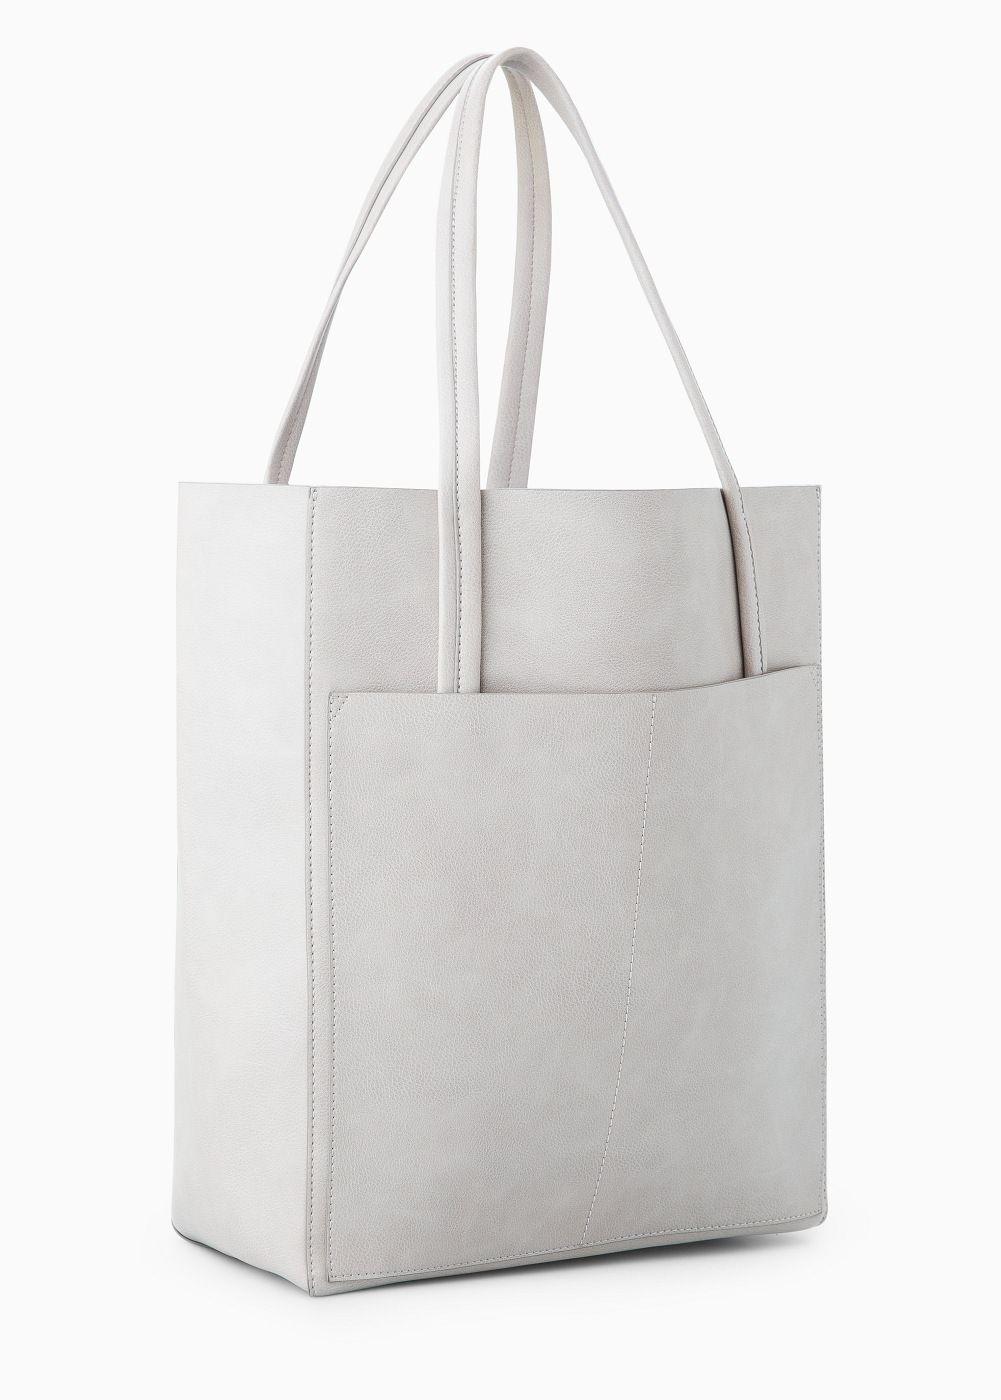 Carteira shopper bolso | Bolsos, Sacos y Closet minimalista